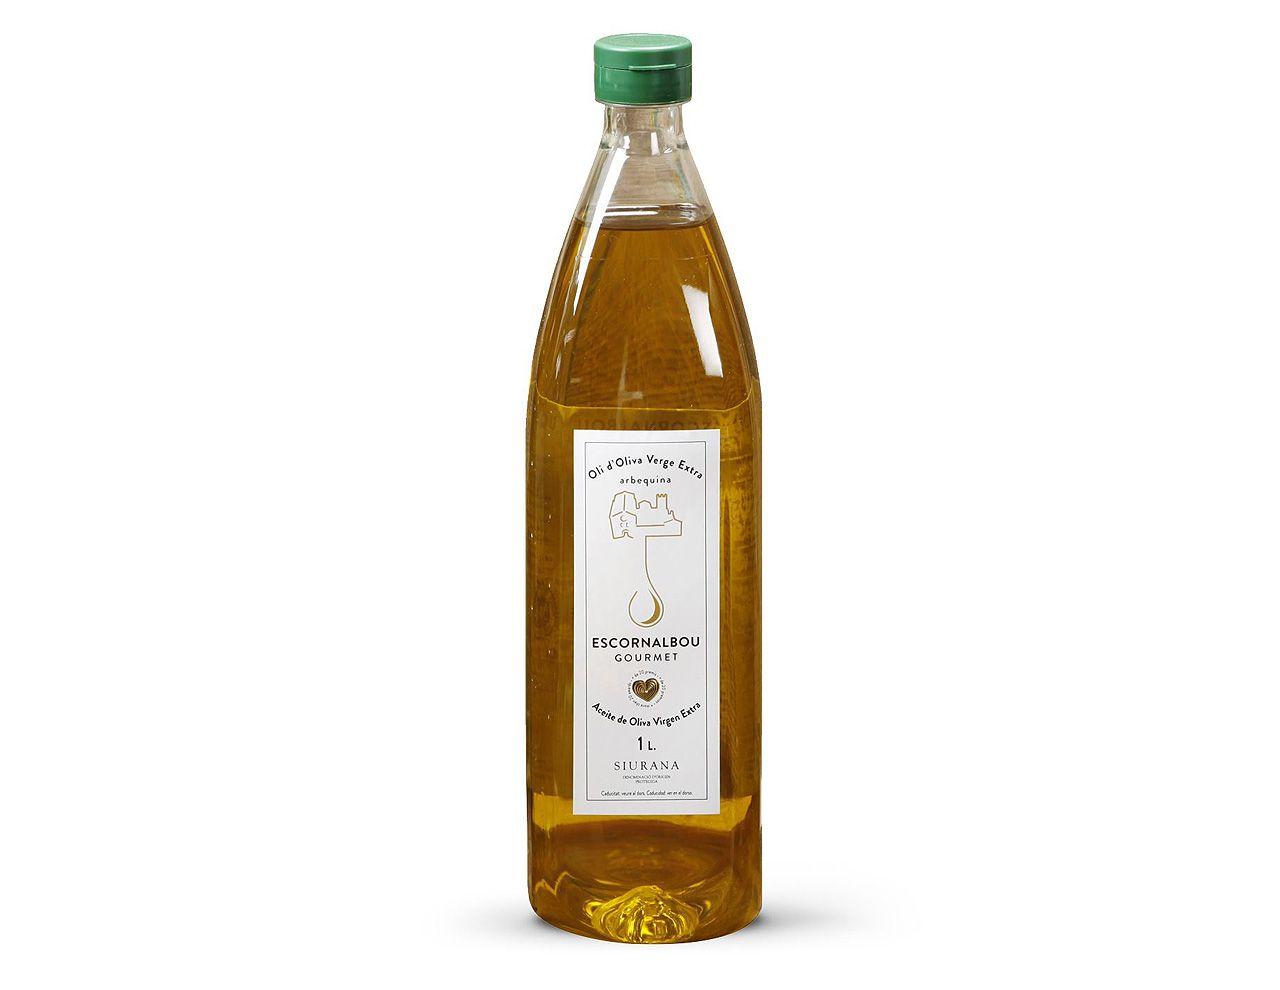 1L Aceite De Oliva Virgen Extra Escornalbou Gourmet – Botella PET